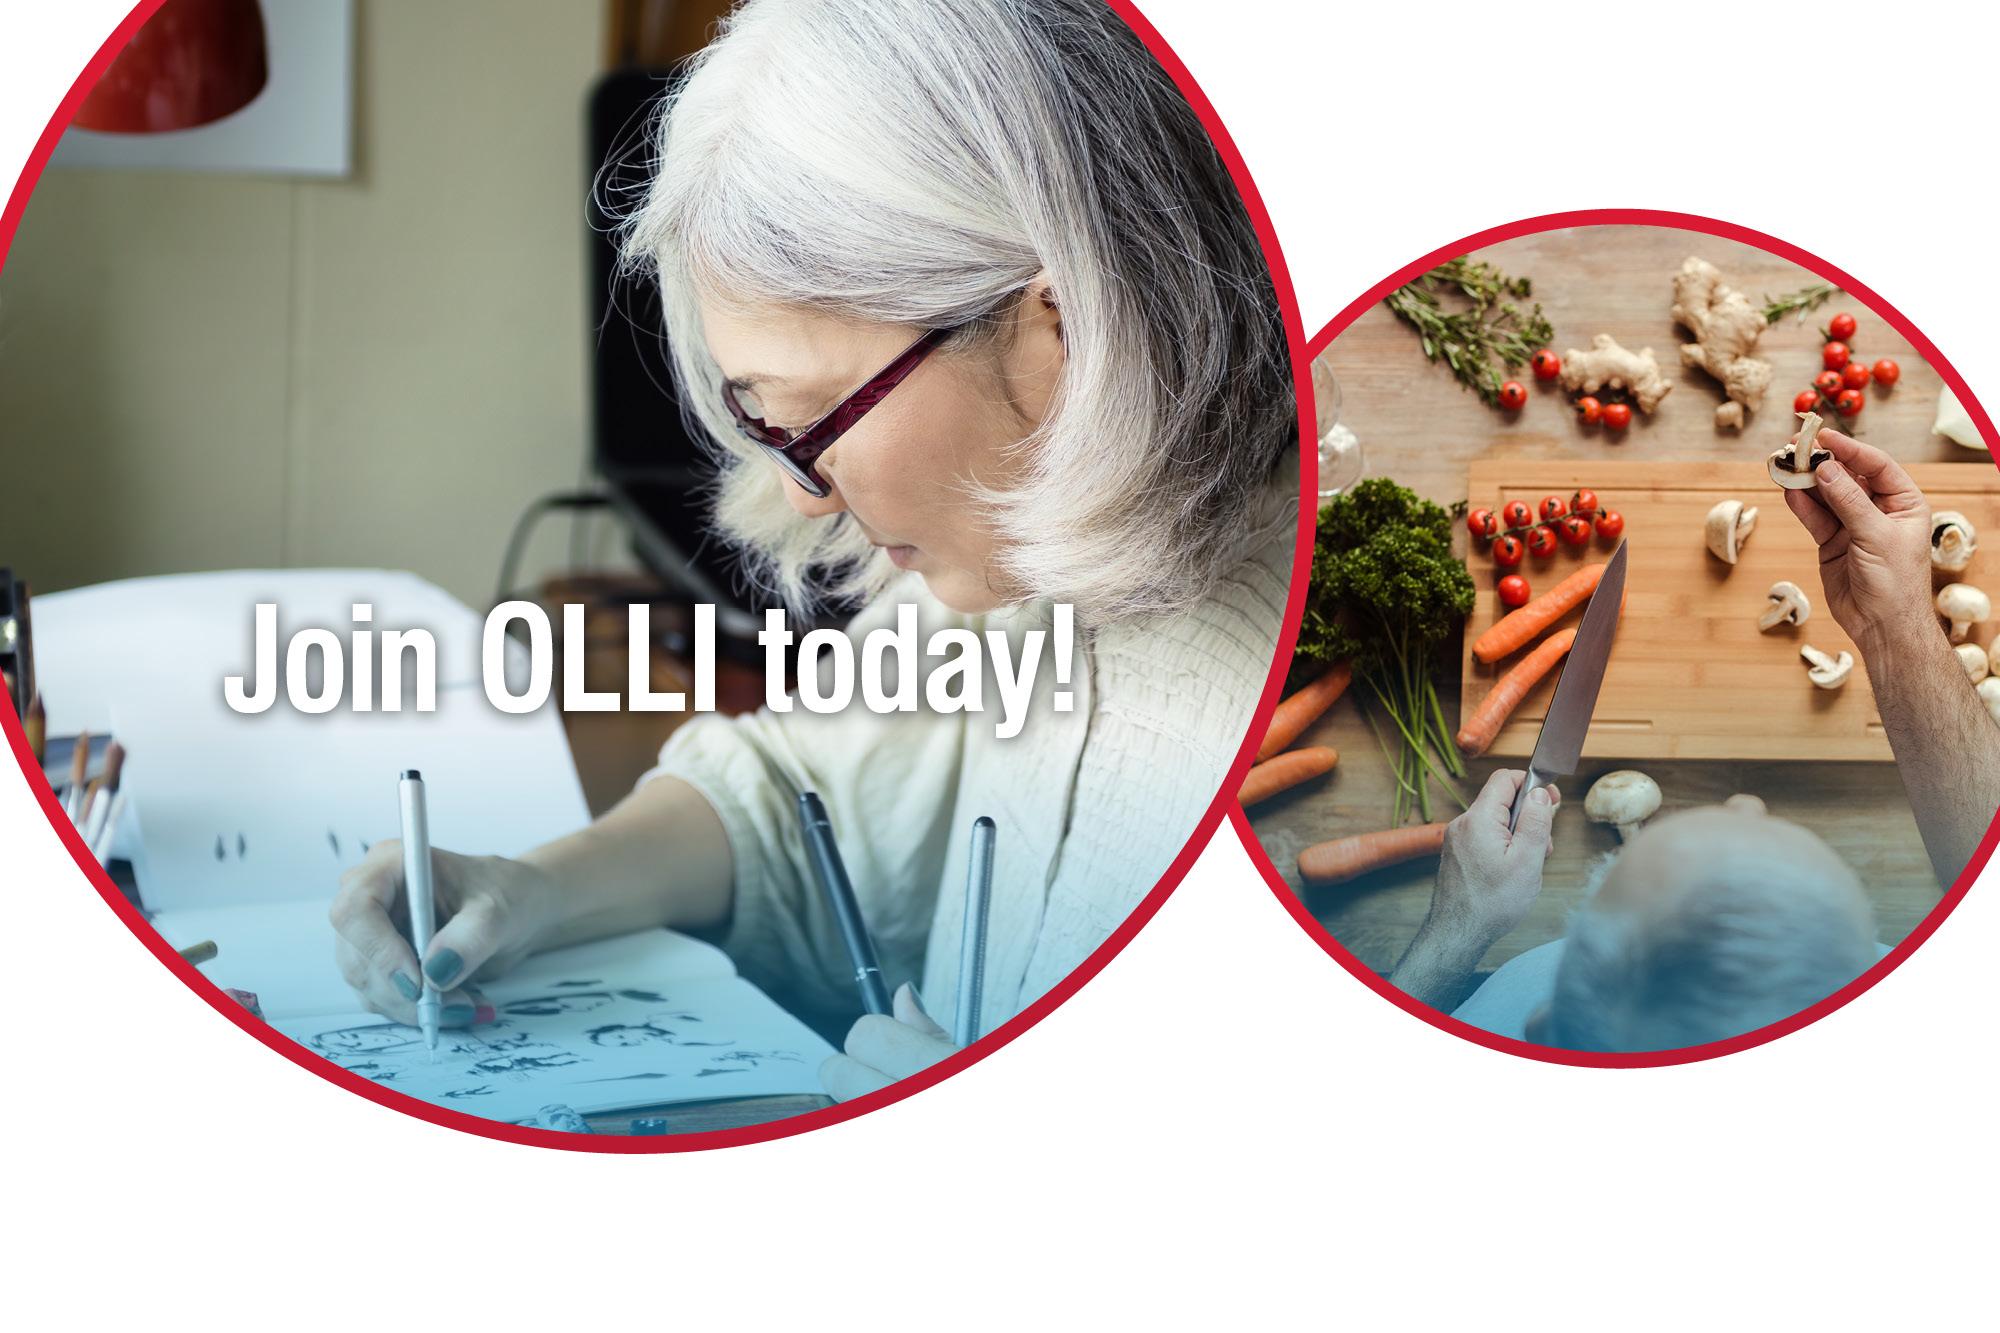 Image for OLLI registration story.